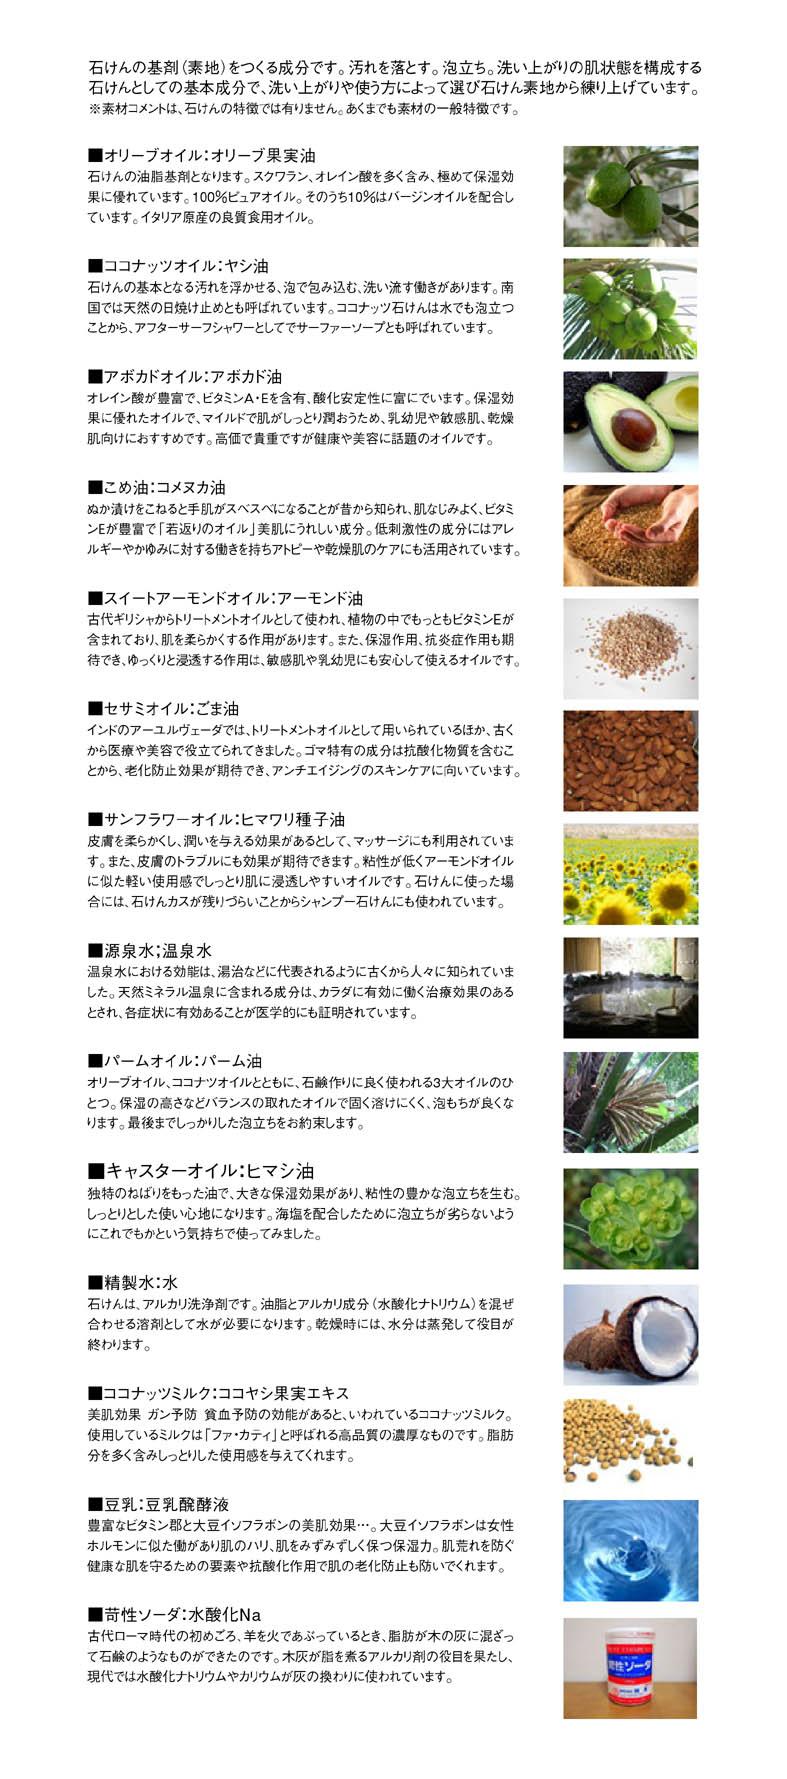 RESPI01-001レイアウト03.jpg